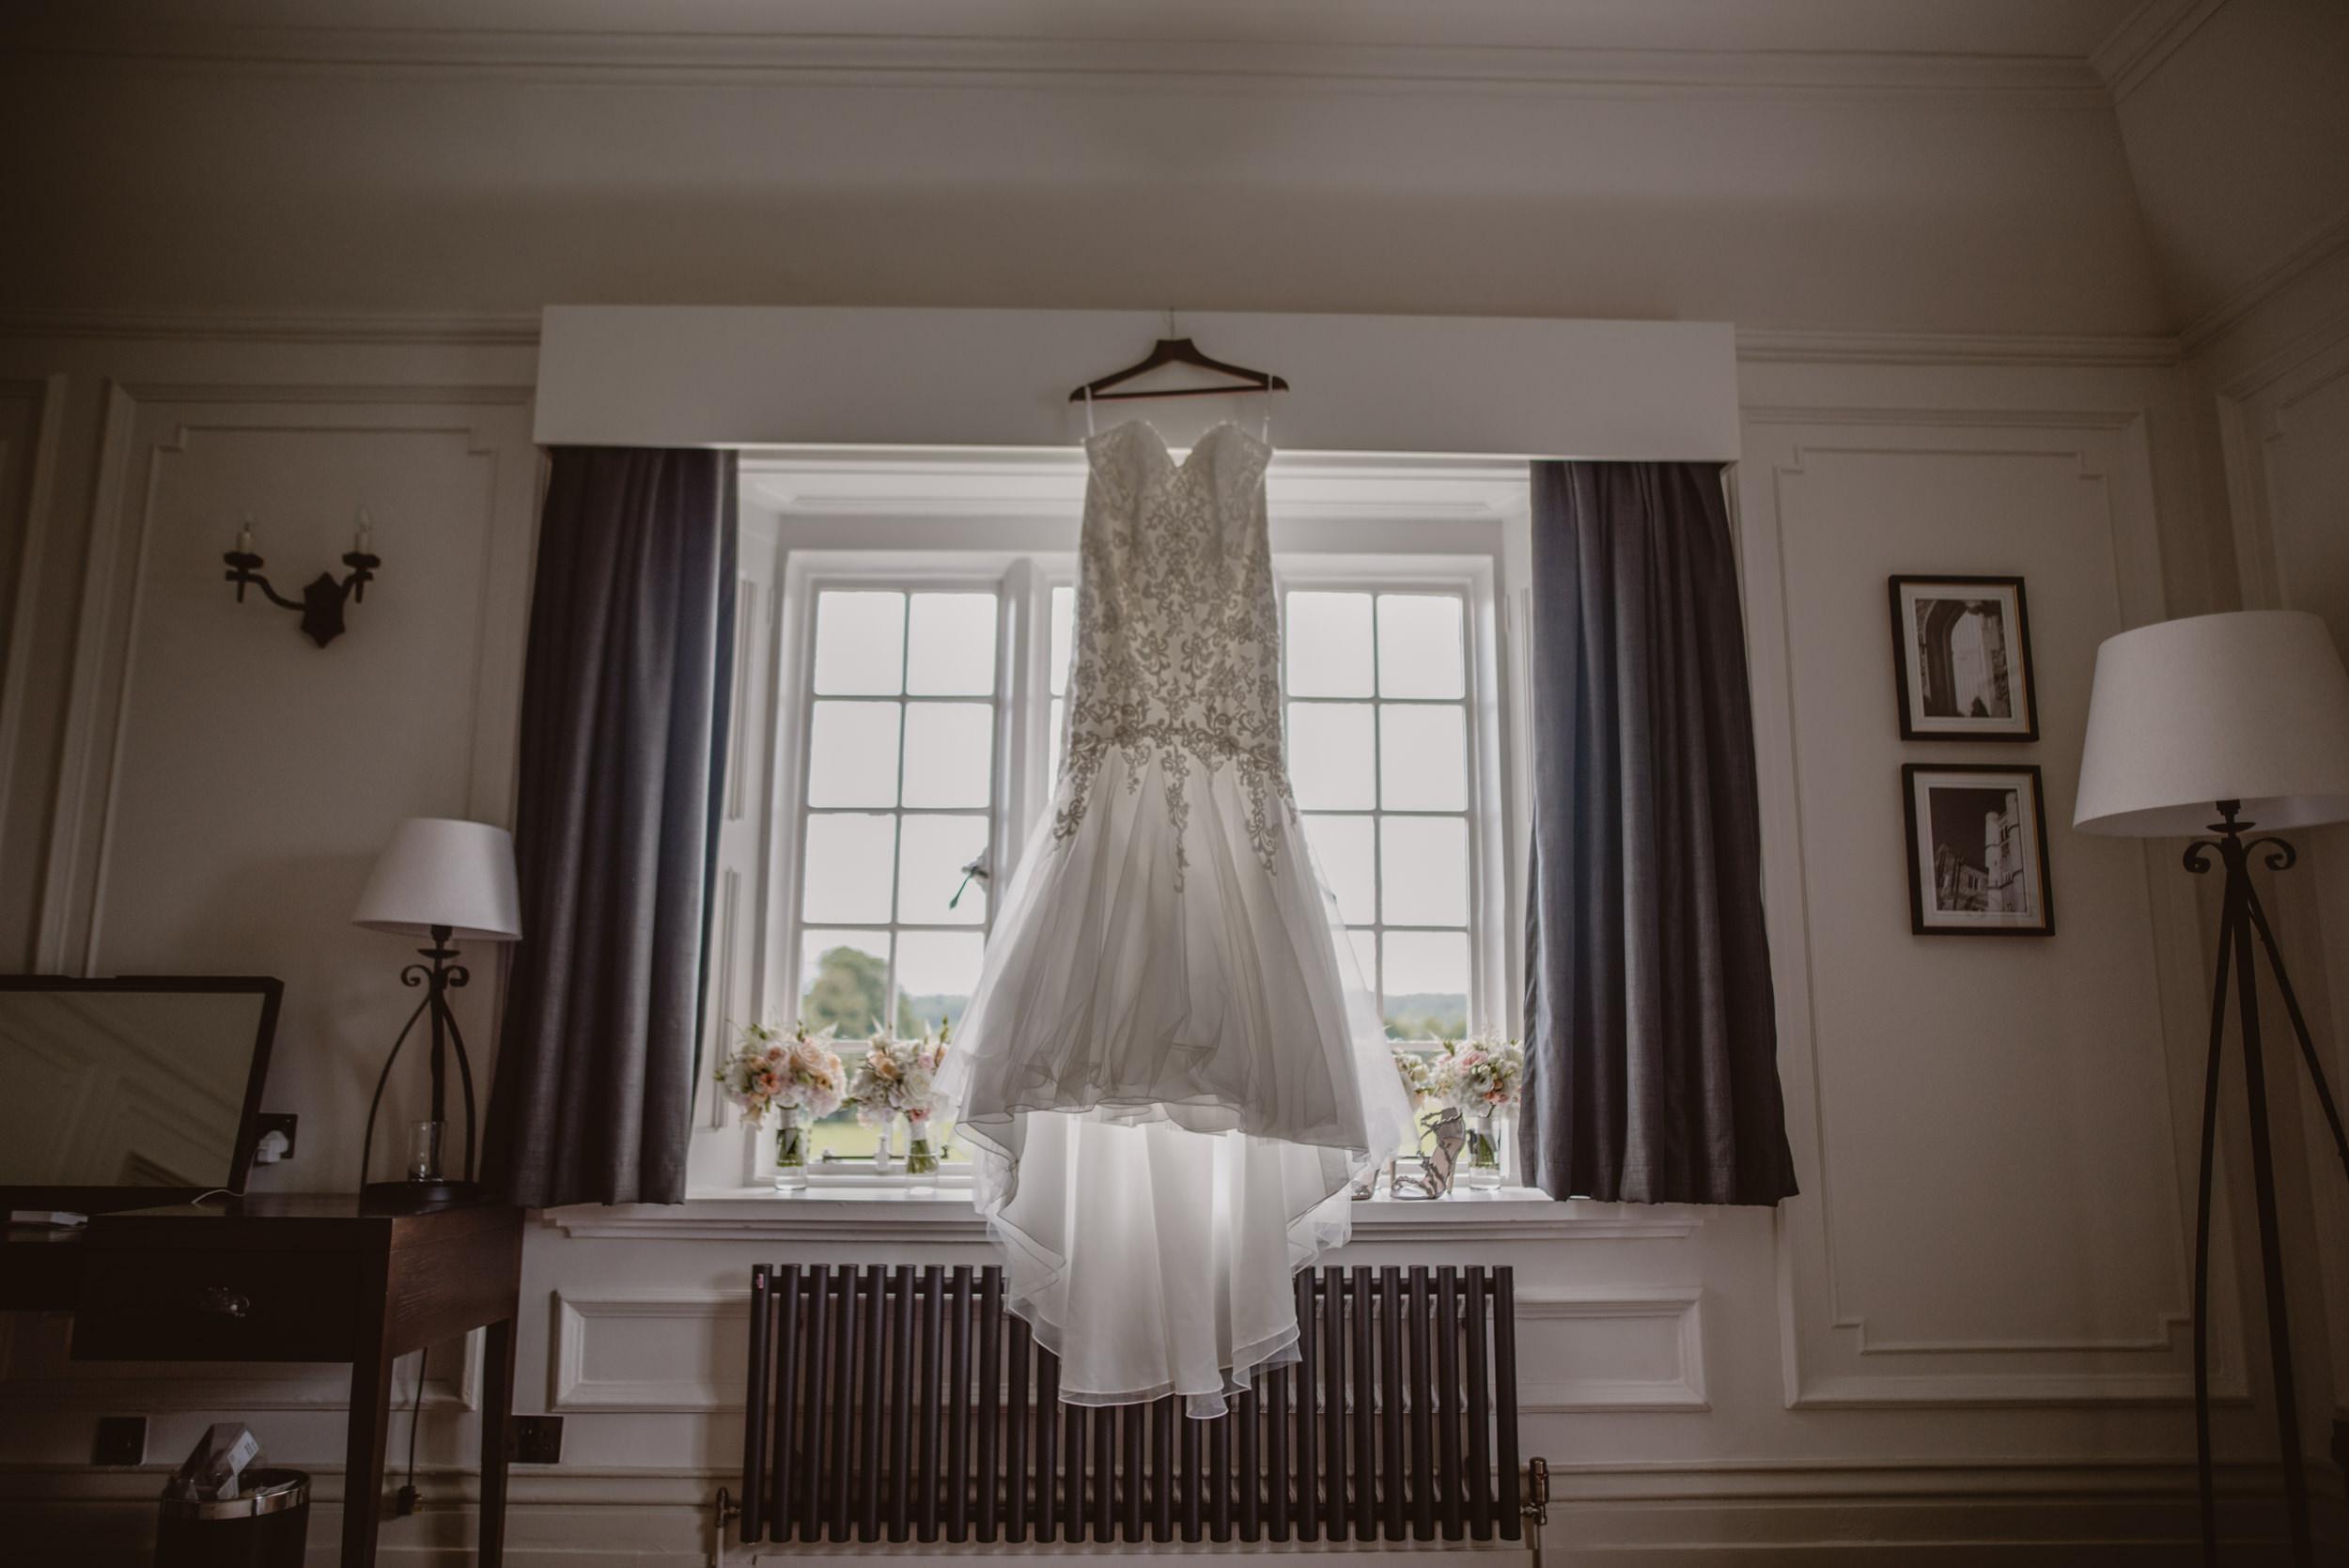 Rachel-and-James-Wedding-Horsley-Towers-State-Manu-Mendoza-Wedding-Photography-166.jpg